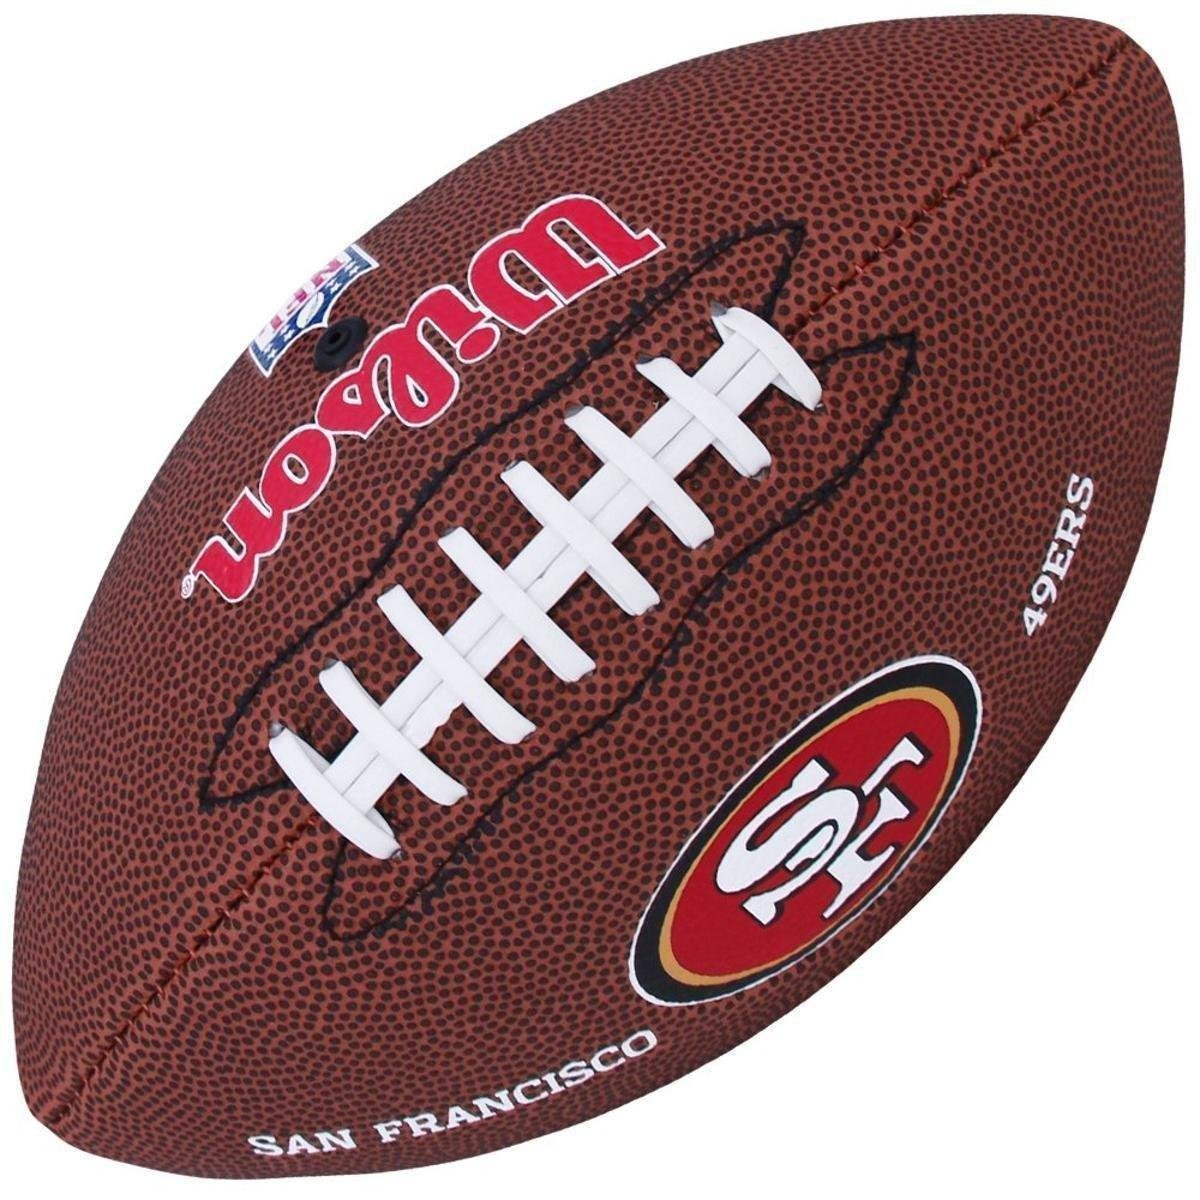 Bola Wilson Futebol Americano NFL San Francisco 49ers - Marrom ... 645062e84b1b6